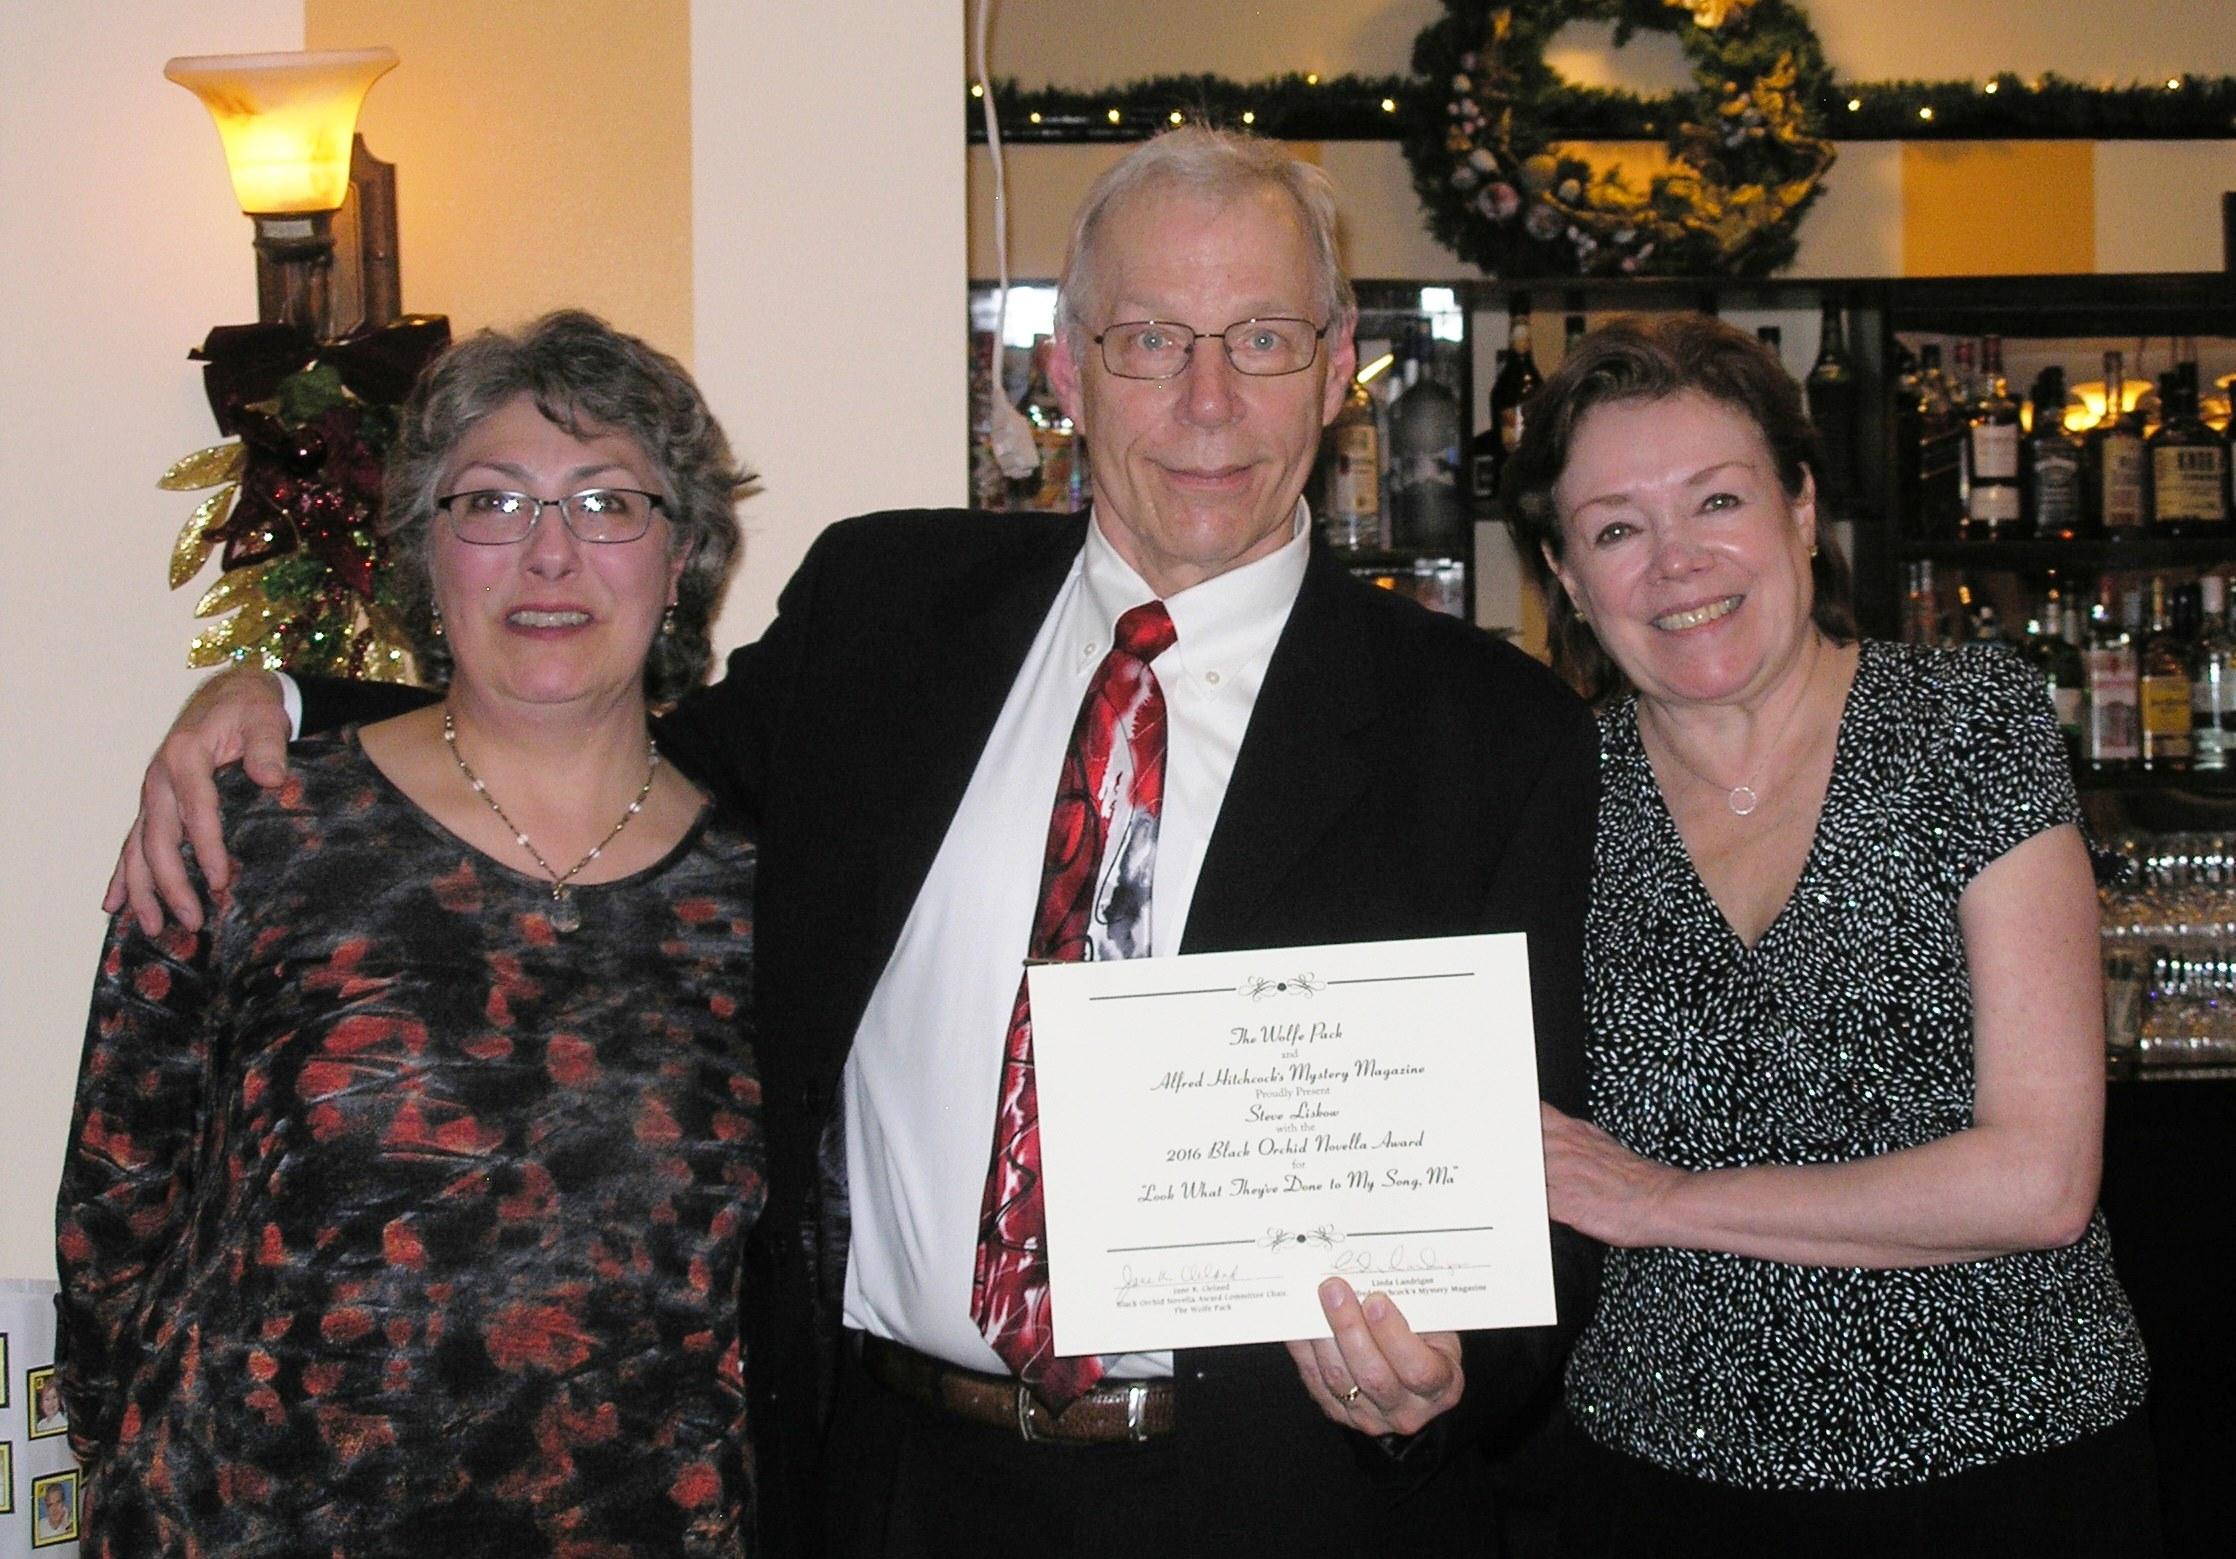 Linda Landrigan, Steve Liskow, Jane K. Cleland, December 3, 2016